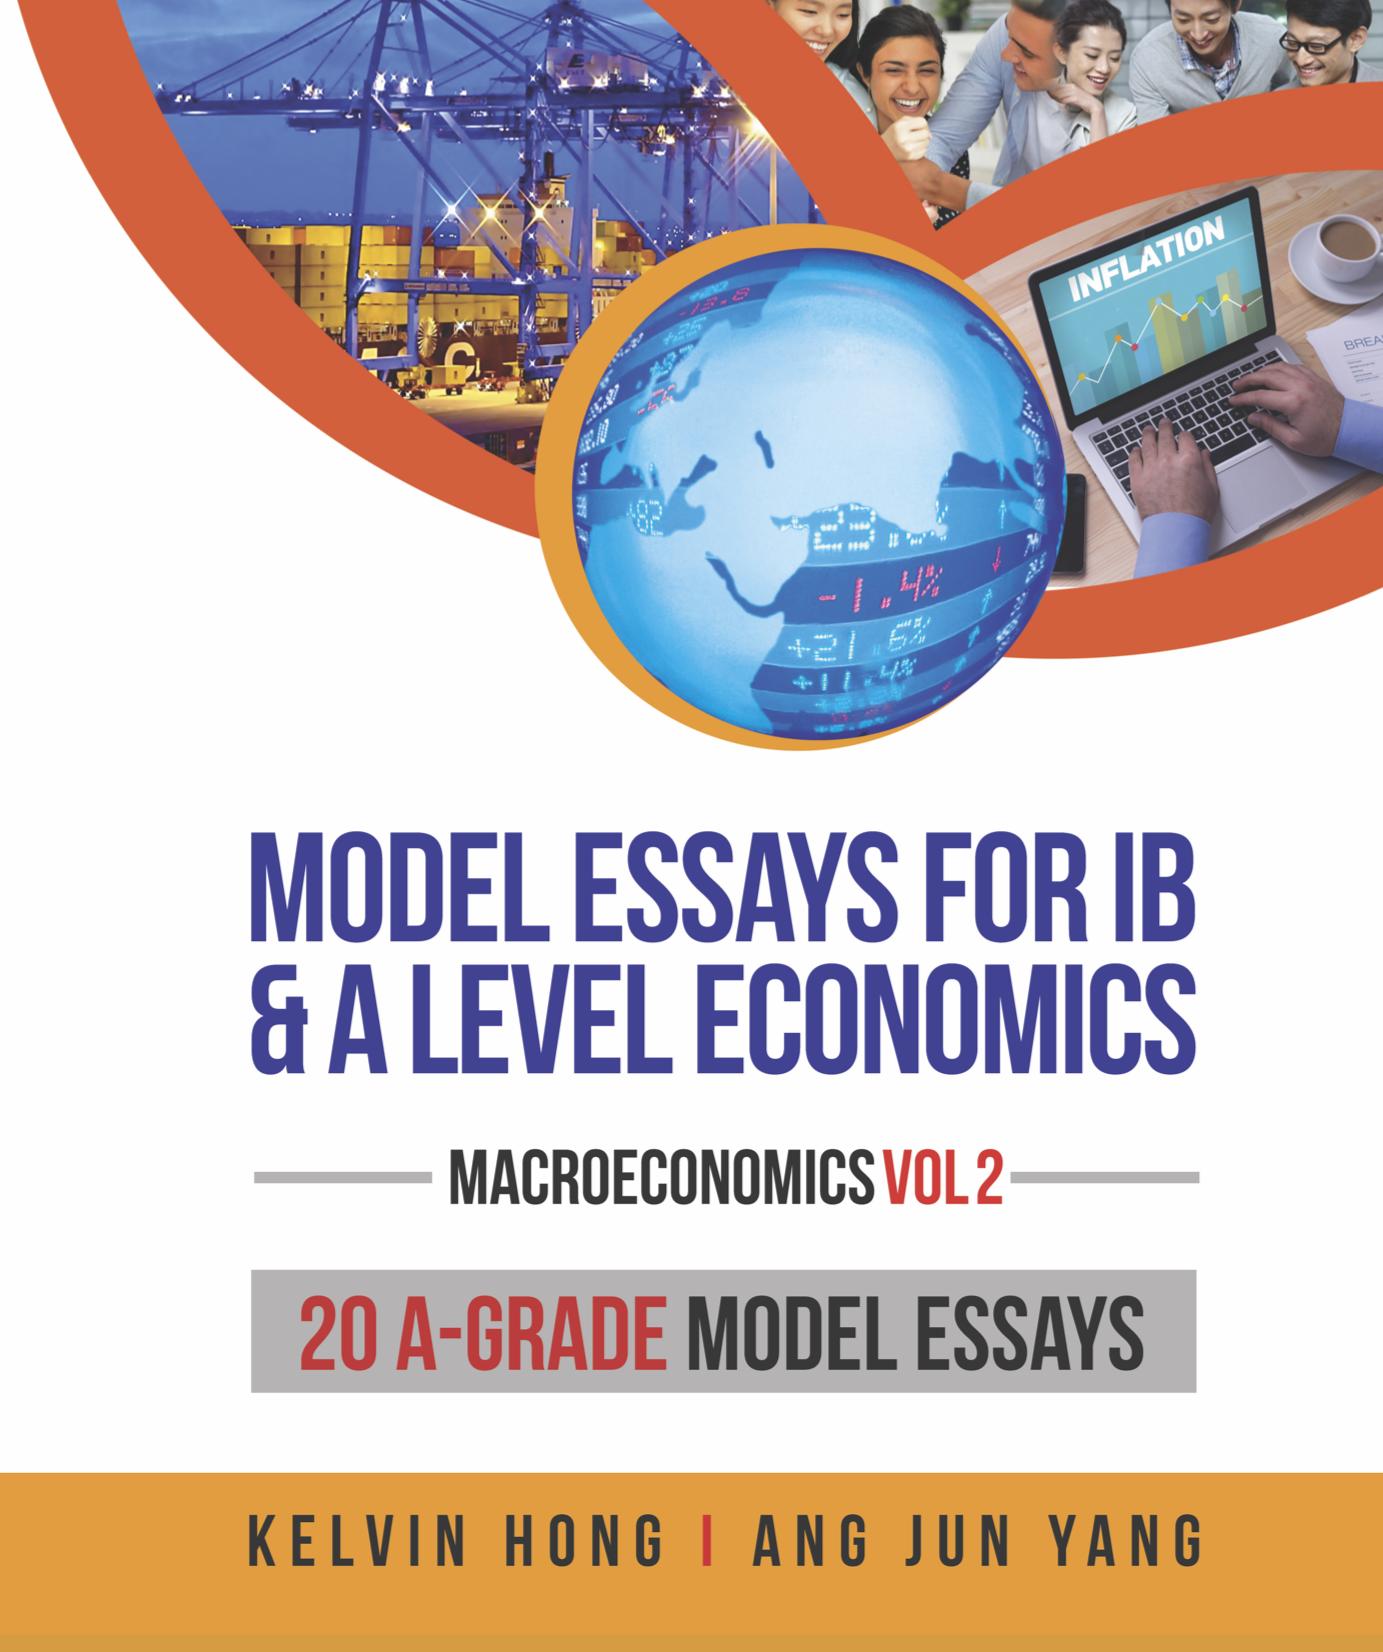 Model Essays Macro 1B Front cover Economics Study Guides